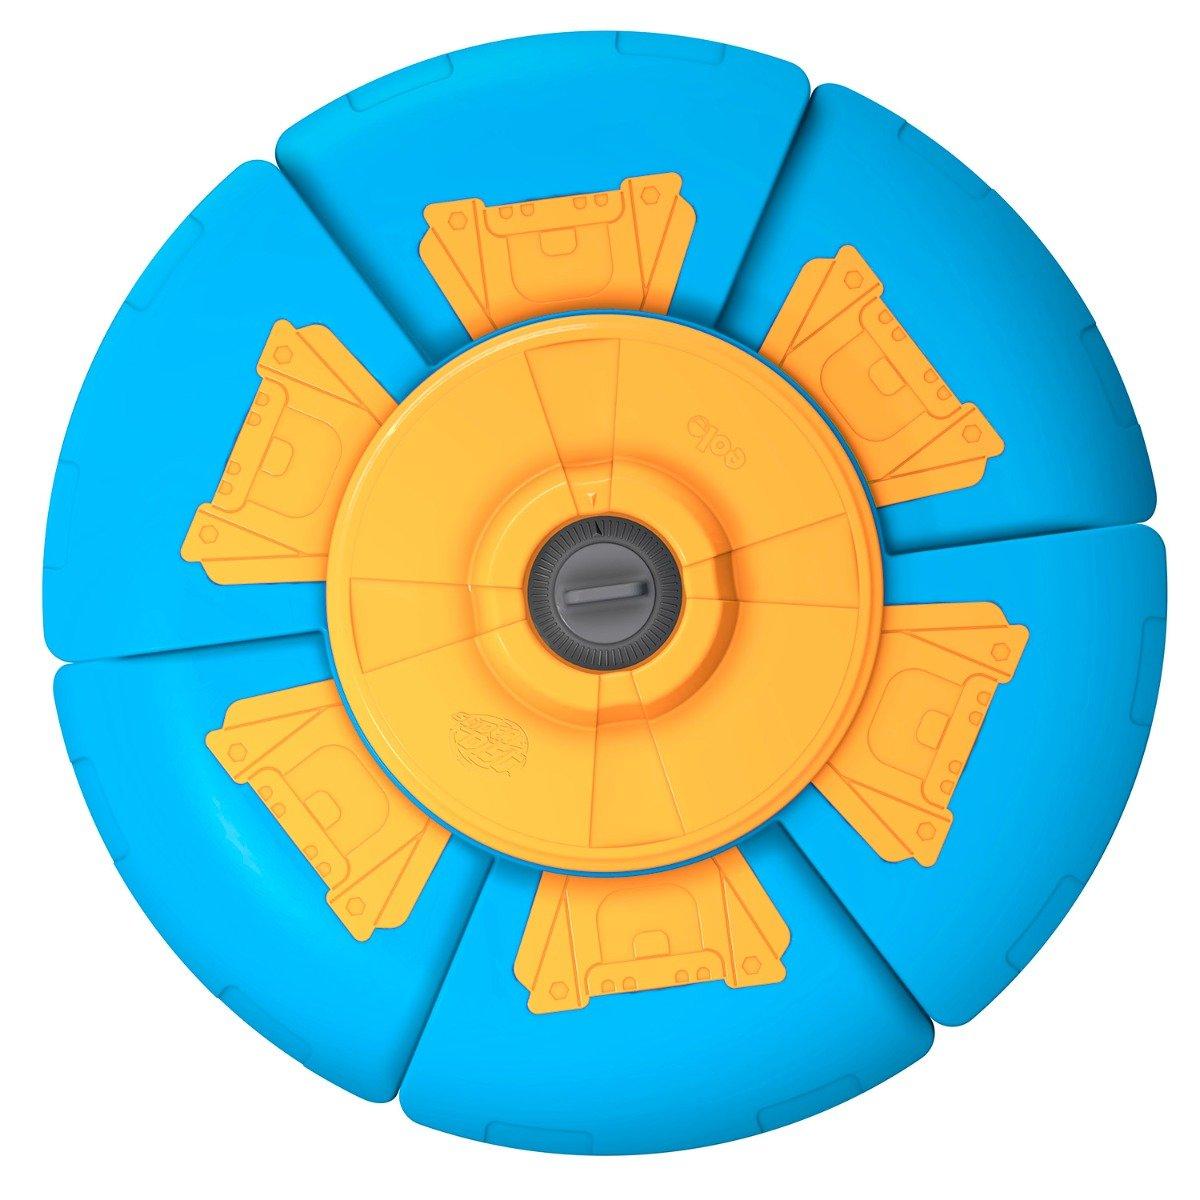 Disc zburator cu timer Slider Disc, Albastru